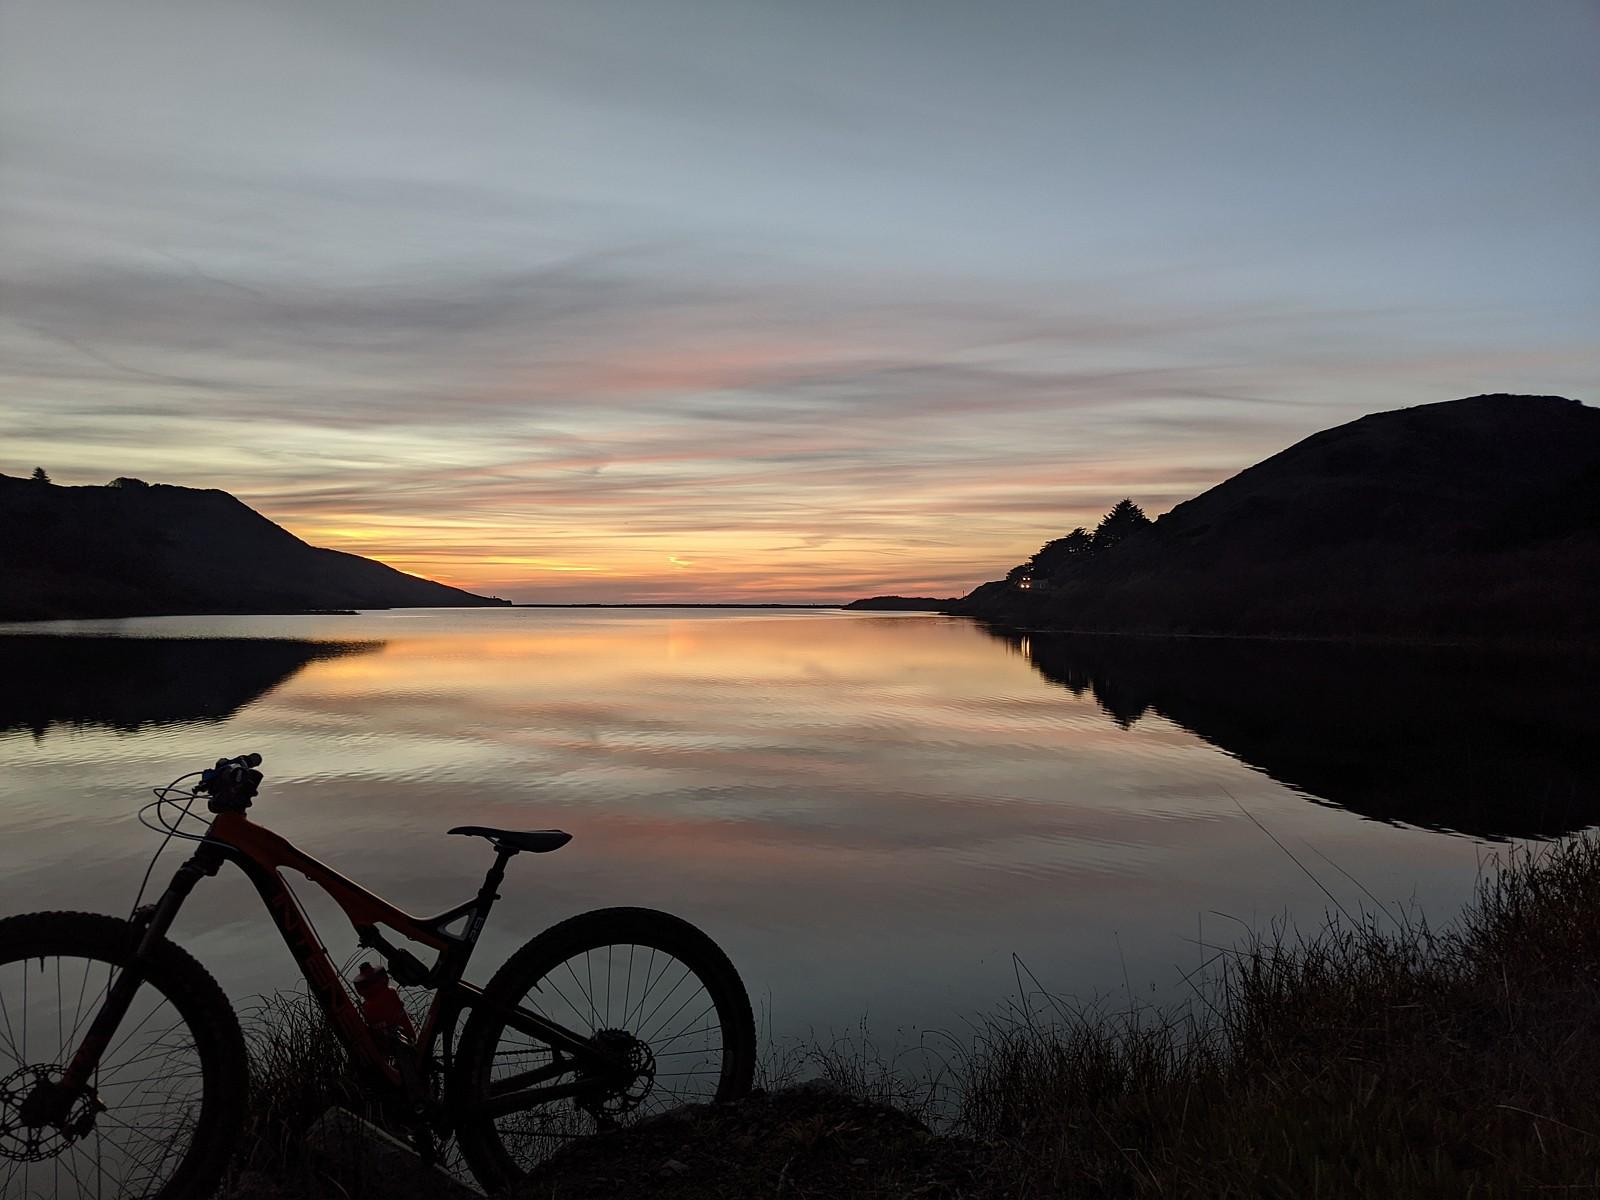 Night Ride - coyoterun - Mountain Biking Pictures - Vital MTB